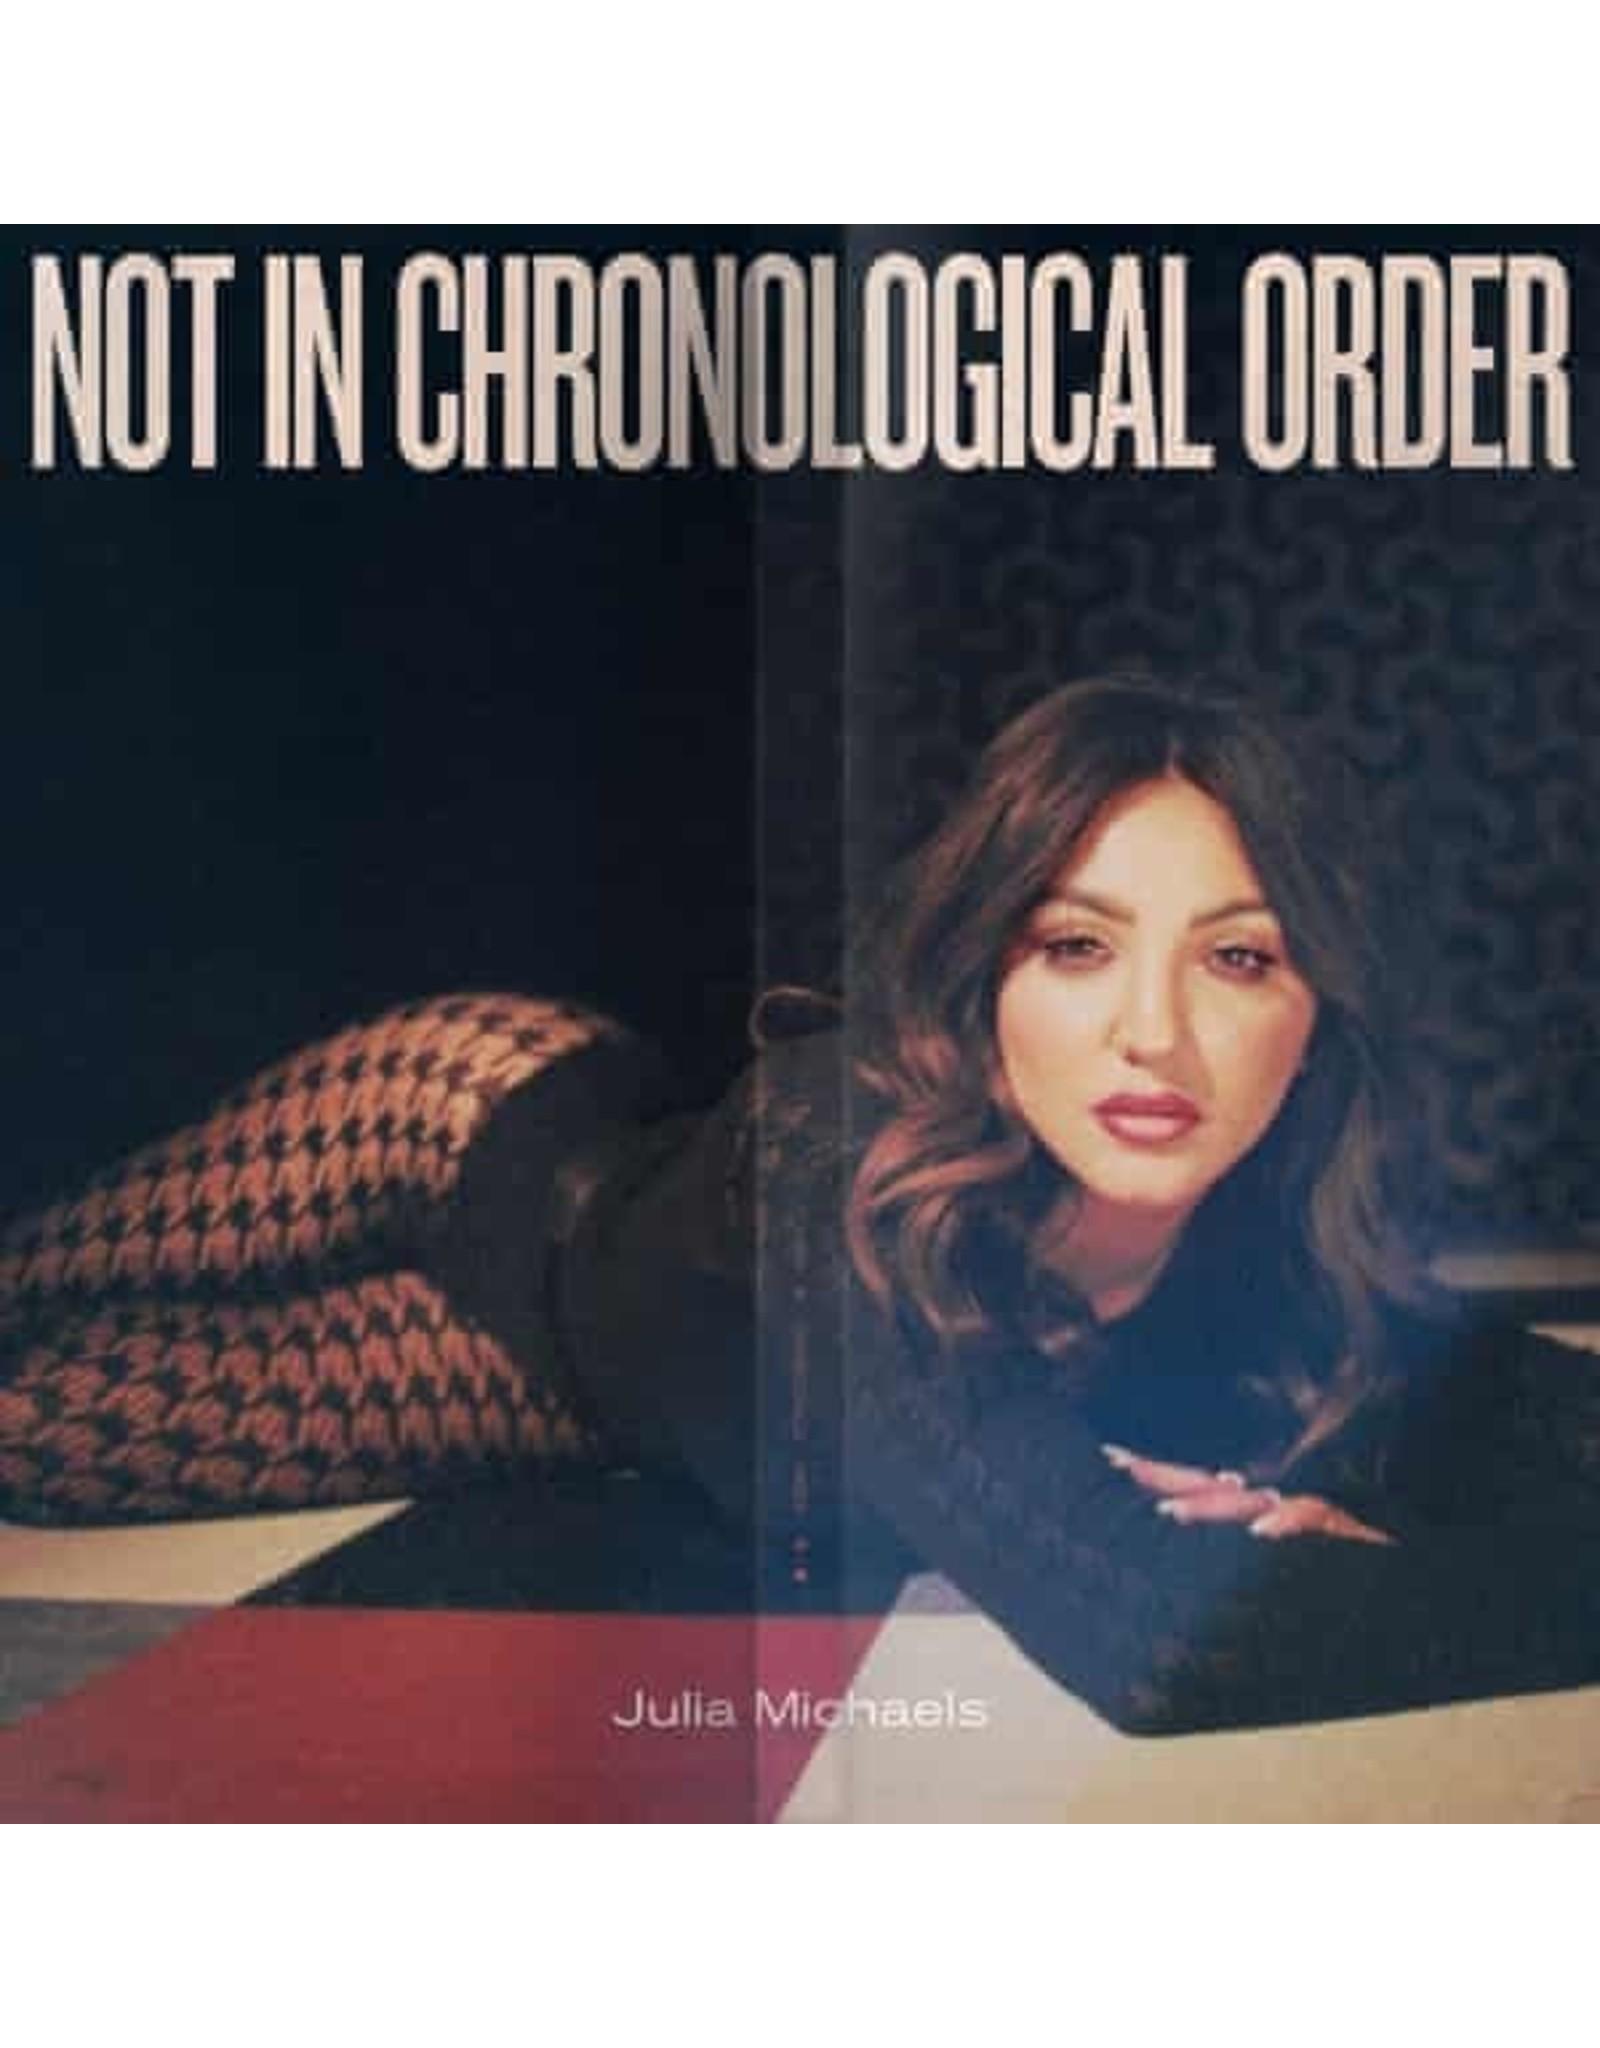 Michaels, Julia - Not In Chronological Order LP